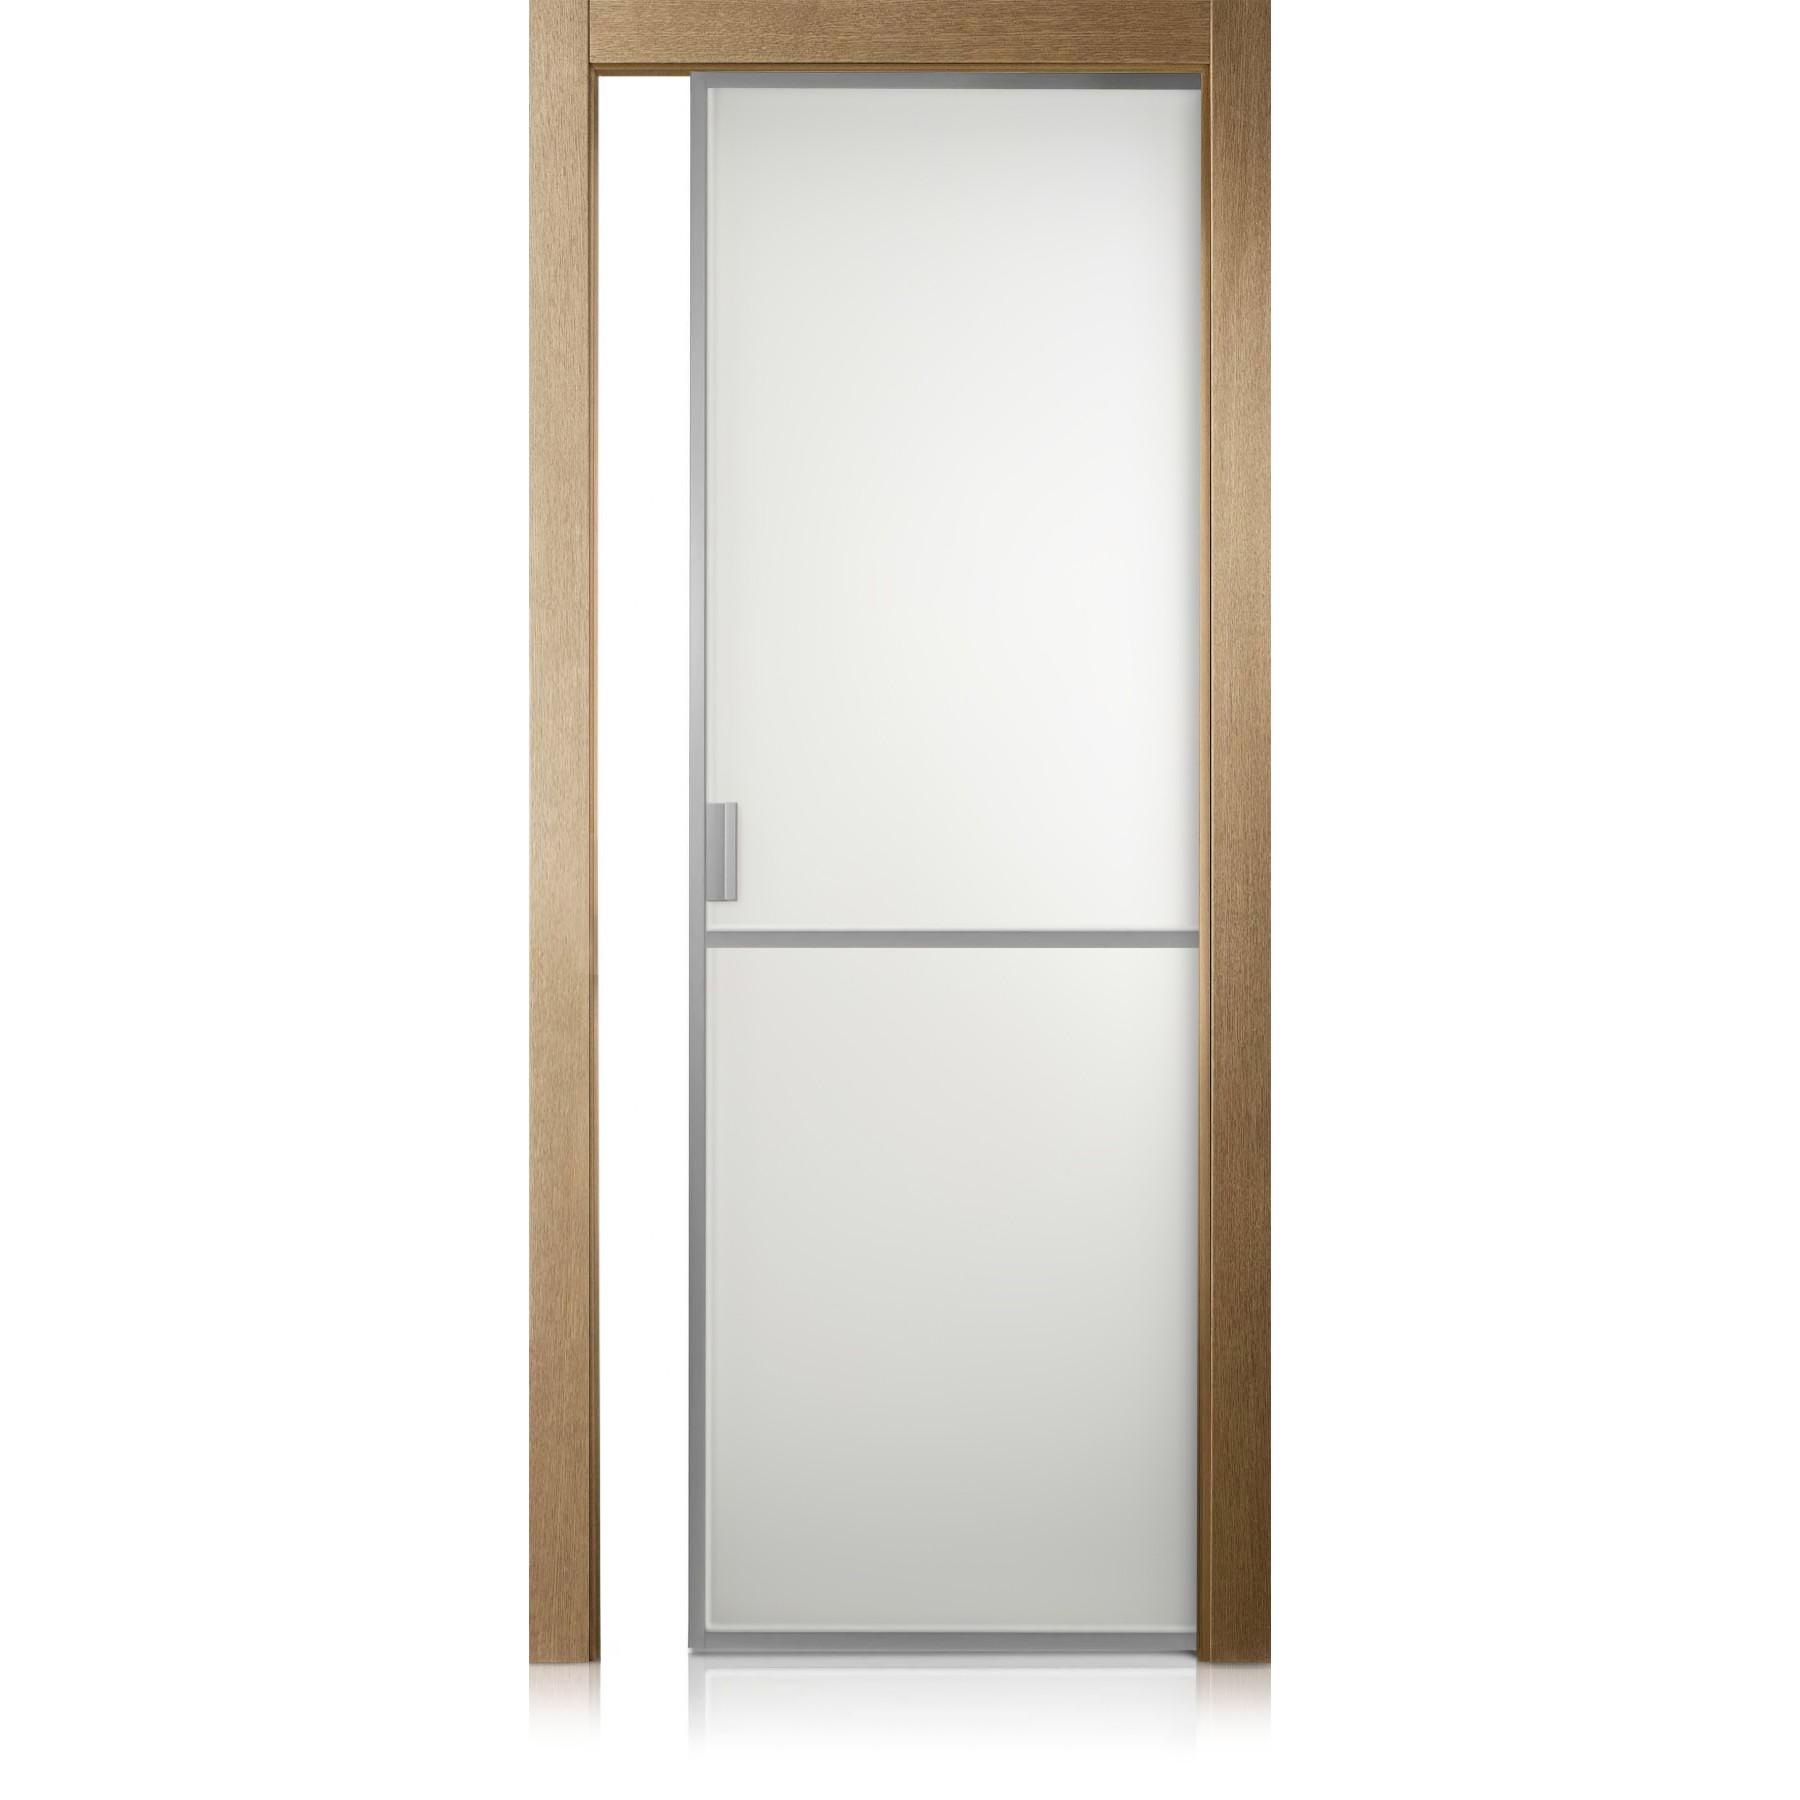 Cristal Frame / 1 ecorovere oro door